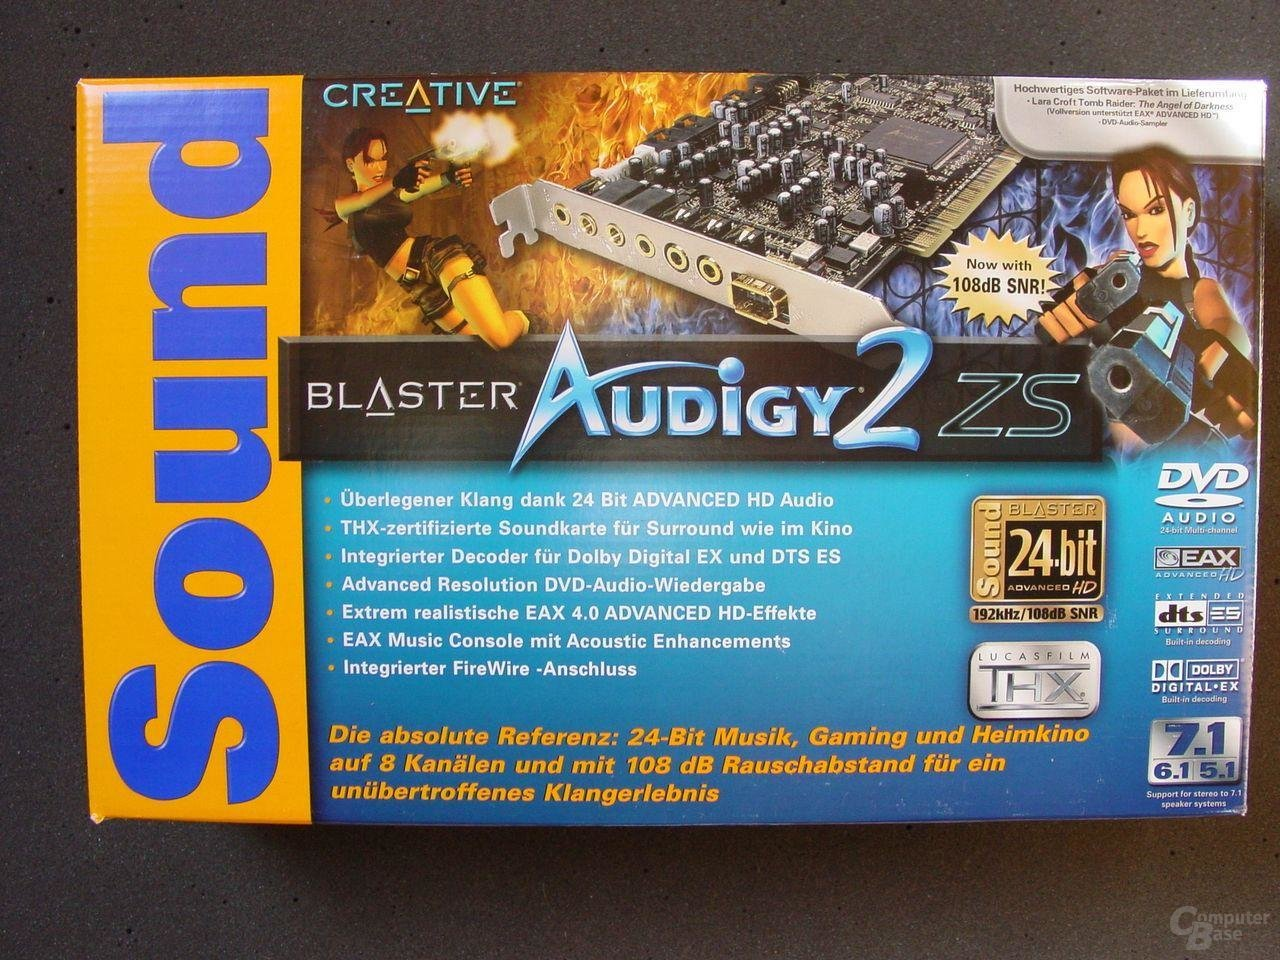 Creative Audigy 2 ZS Verpackung